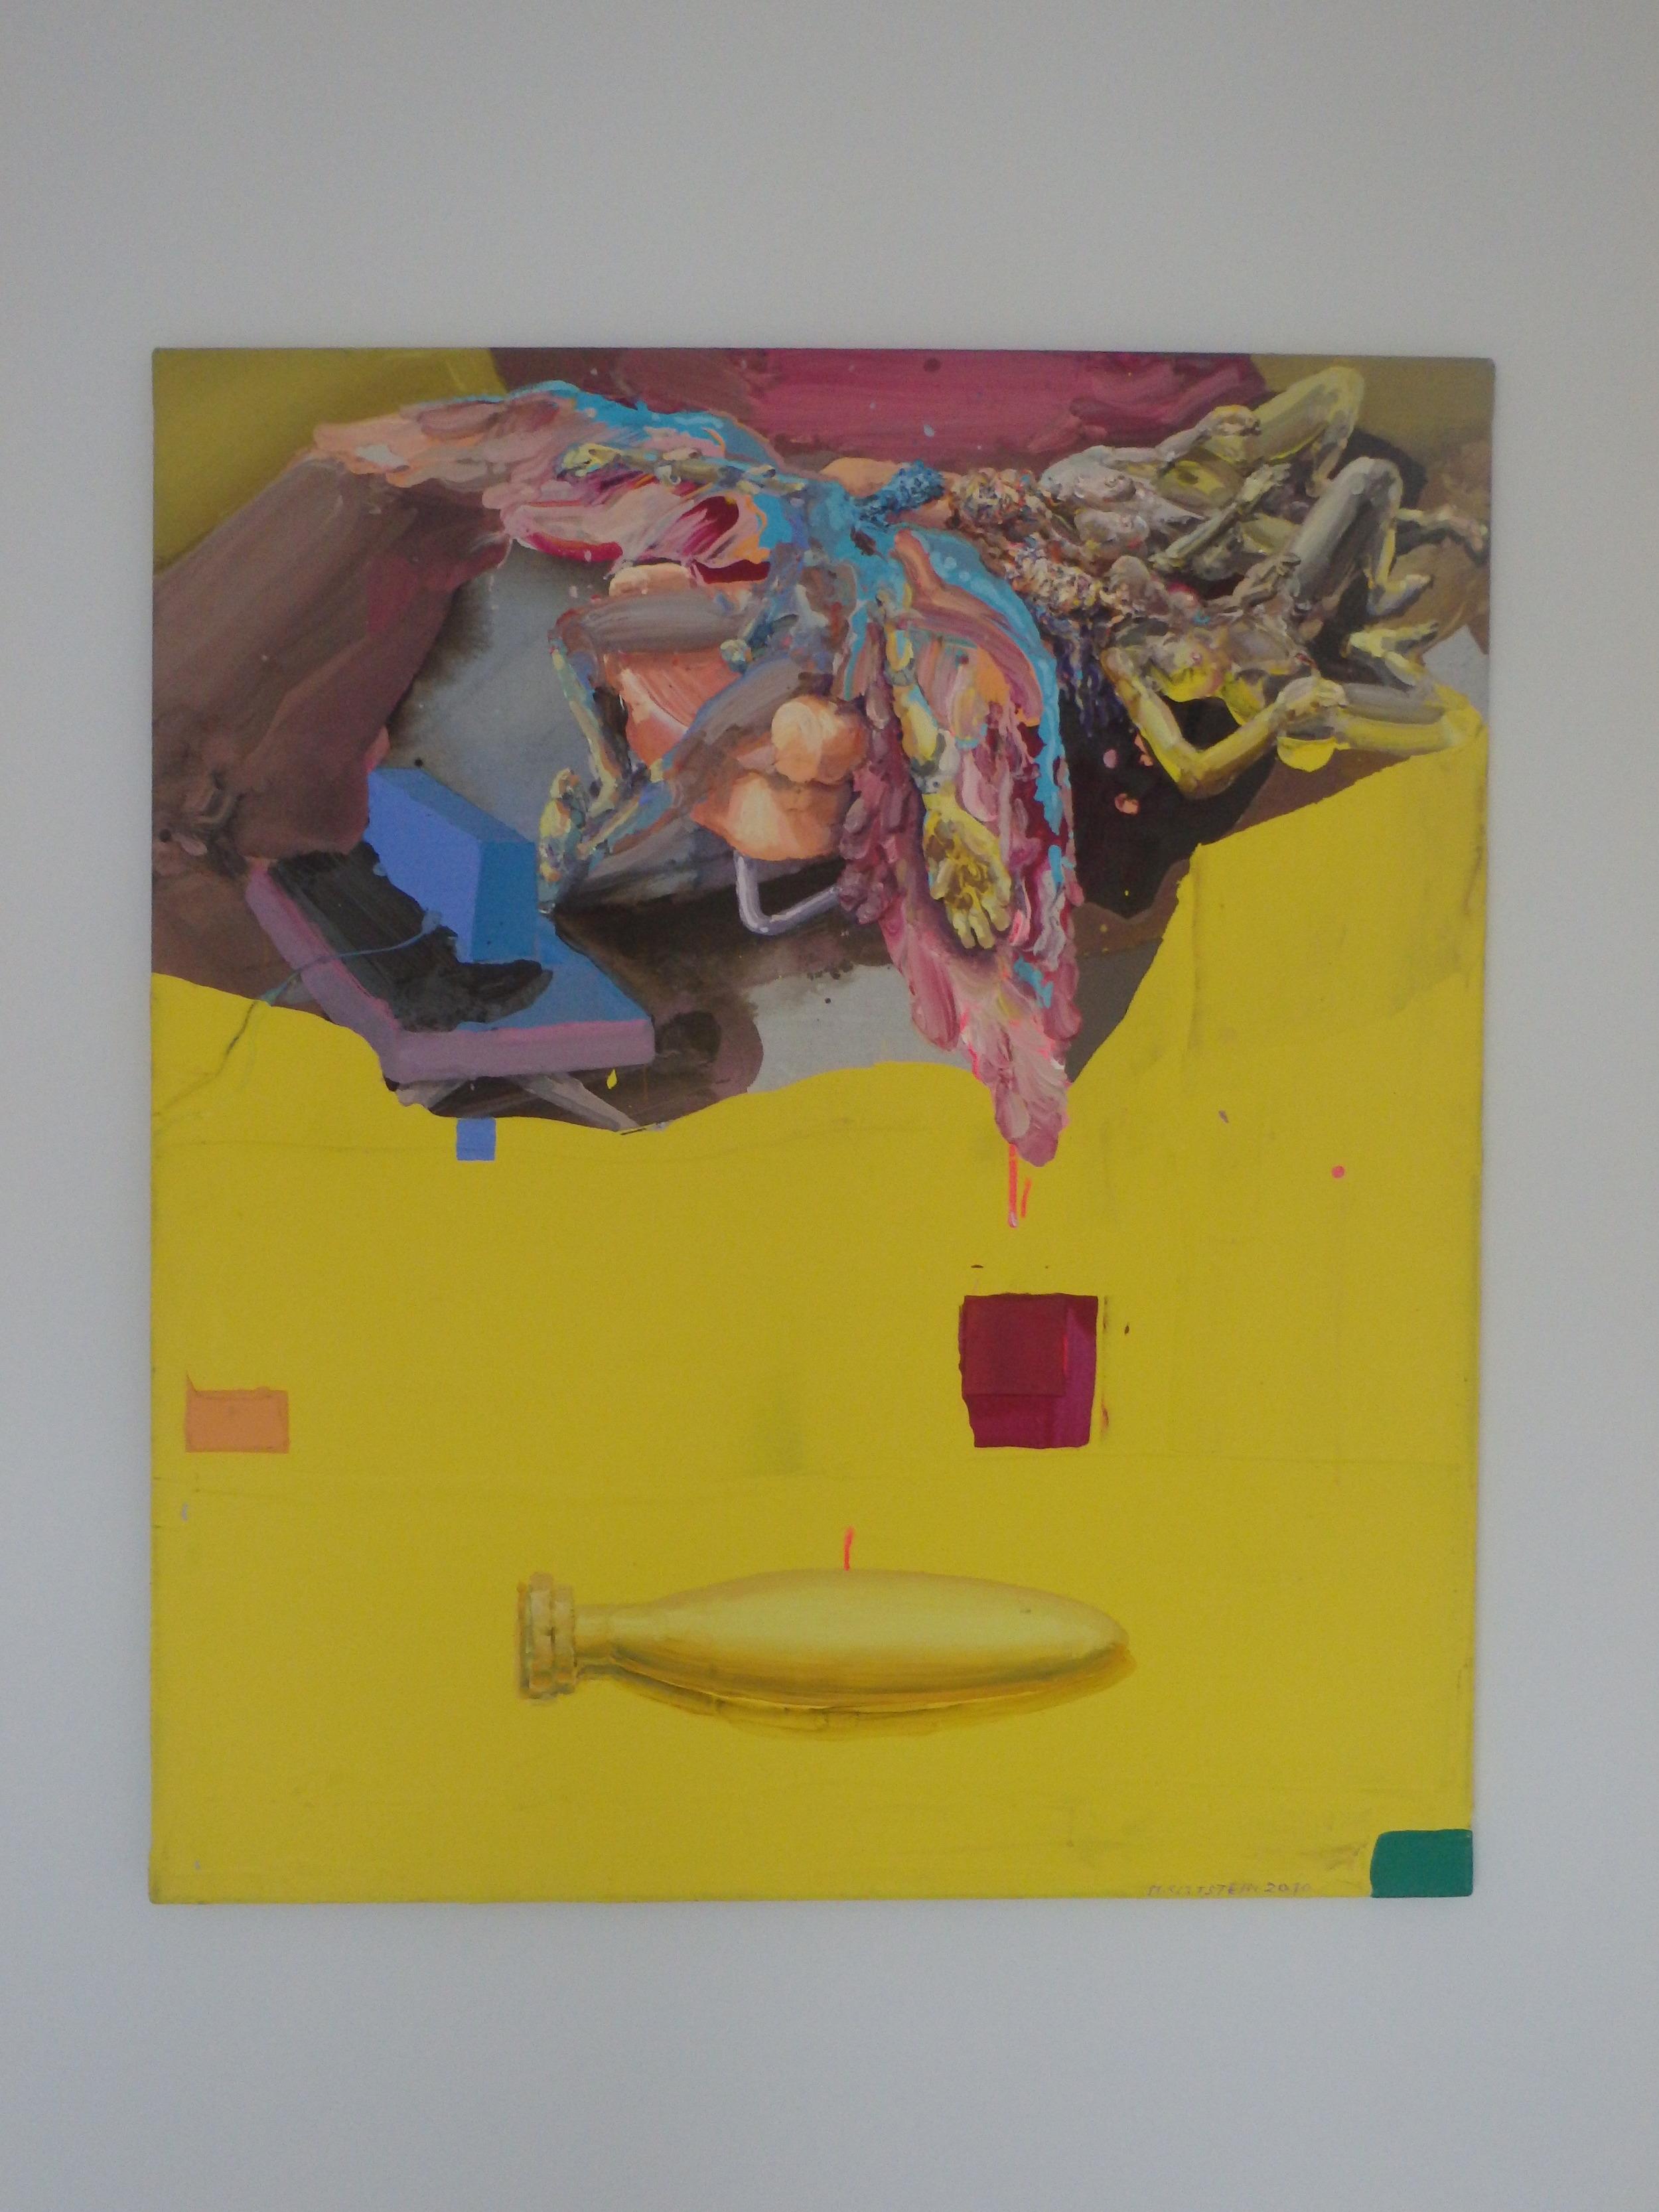 Michael Rittstein, Cosi ve zdi (Bombarďák), 2010, plátno, akryl, 120 x 140 cm